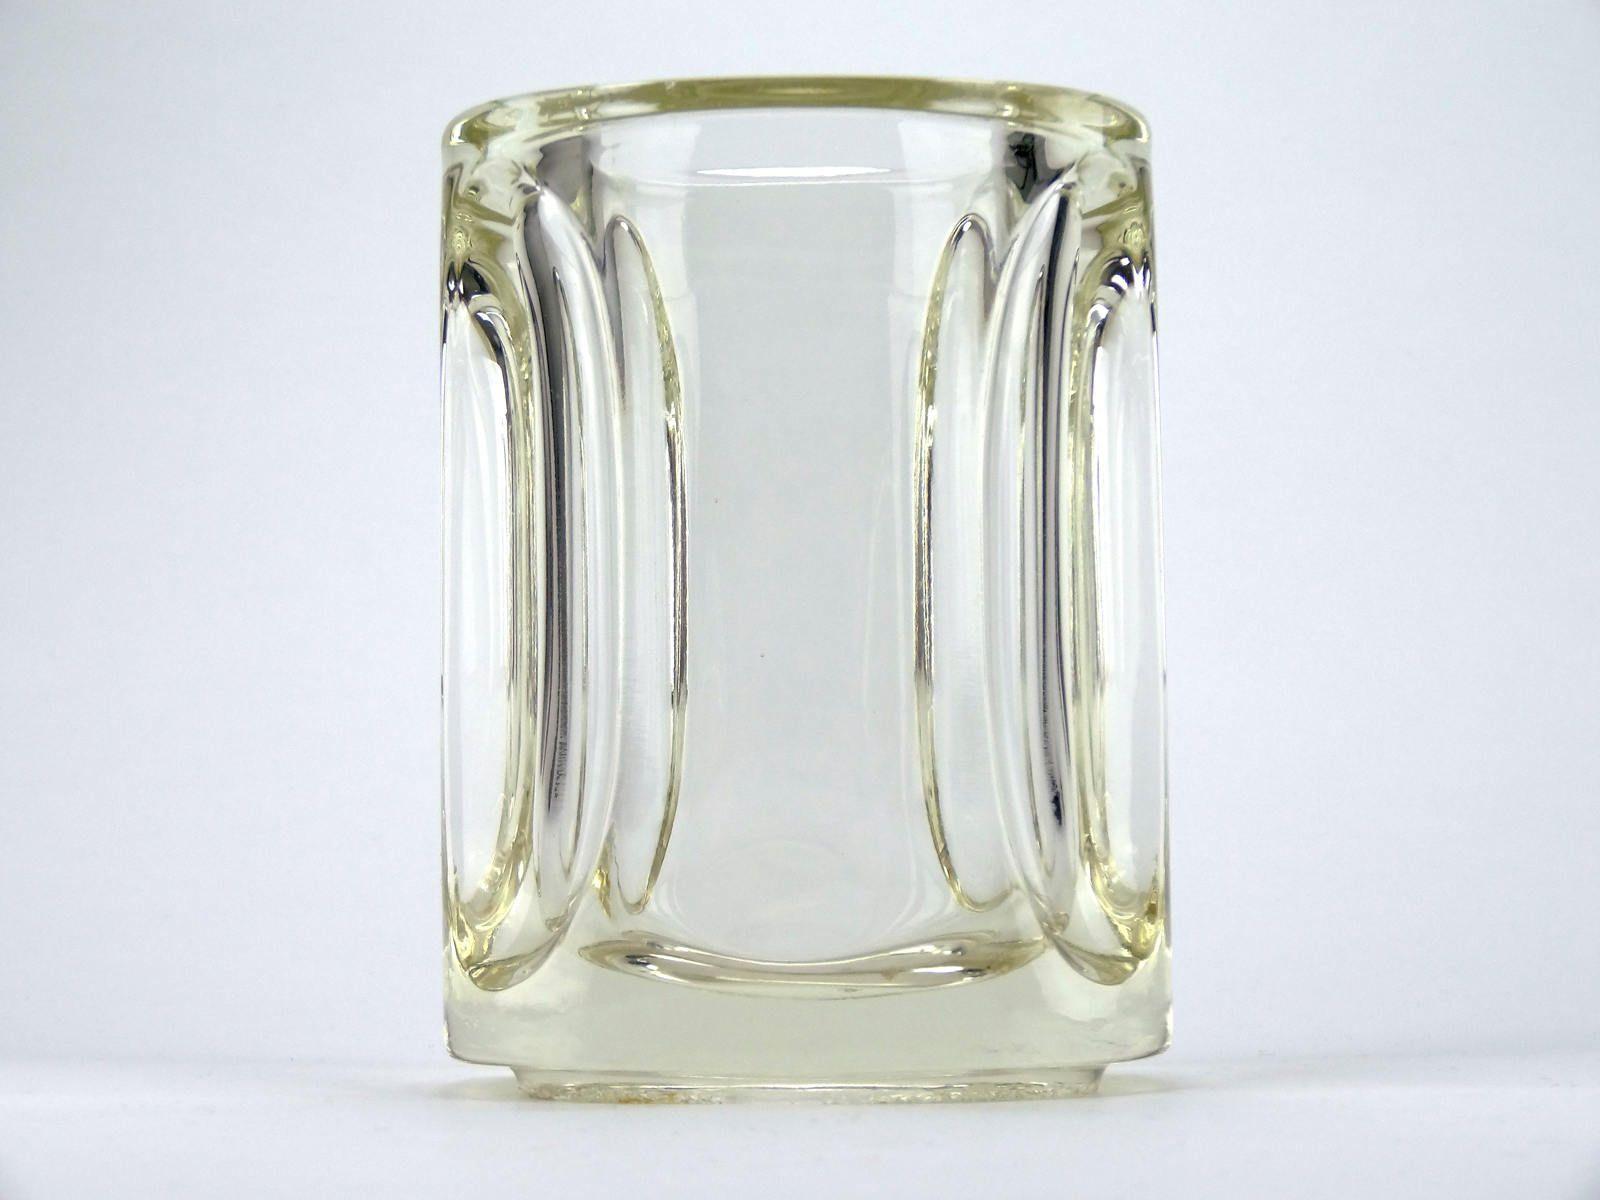 market clear xxx world product vases glass barcelona do vase